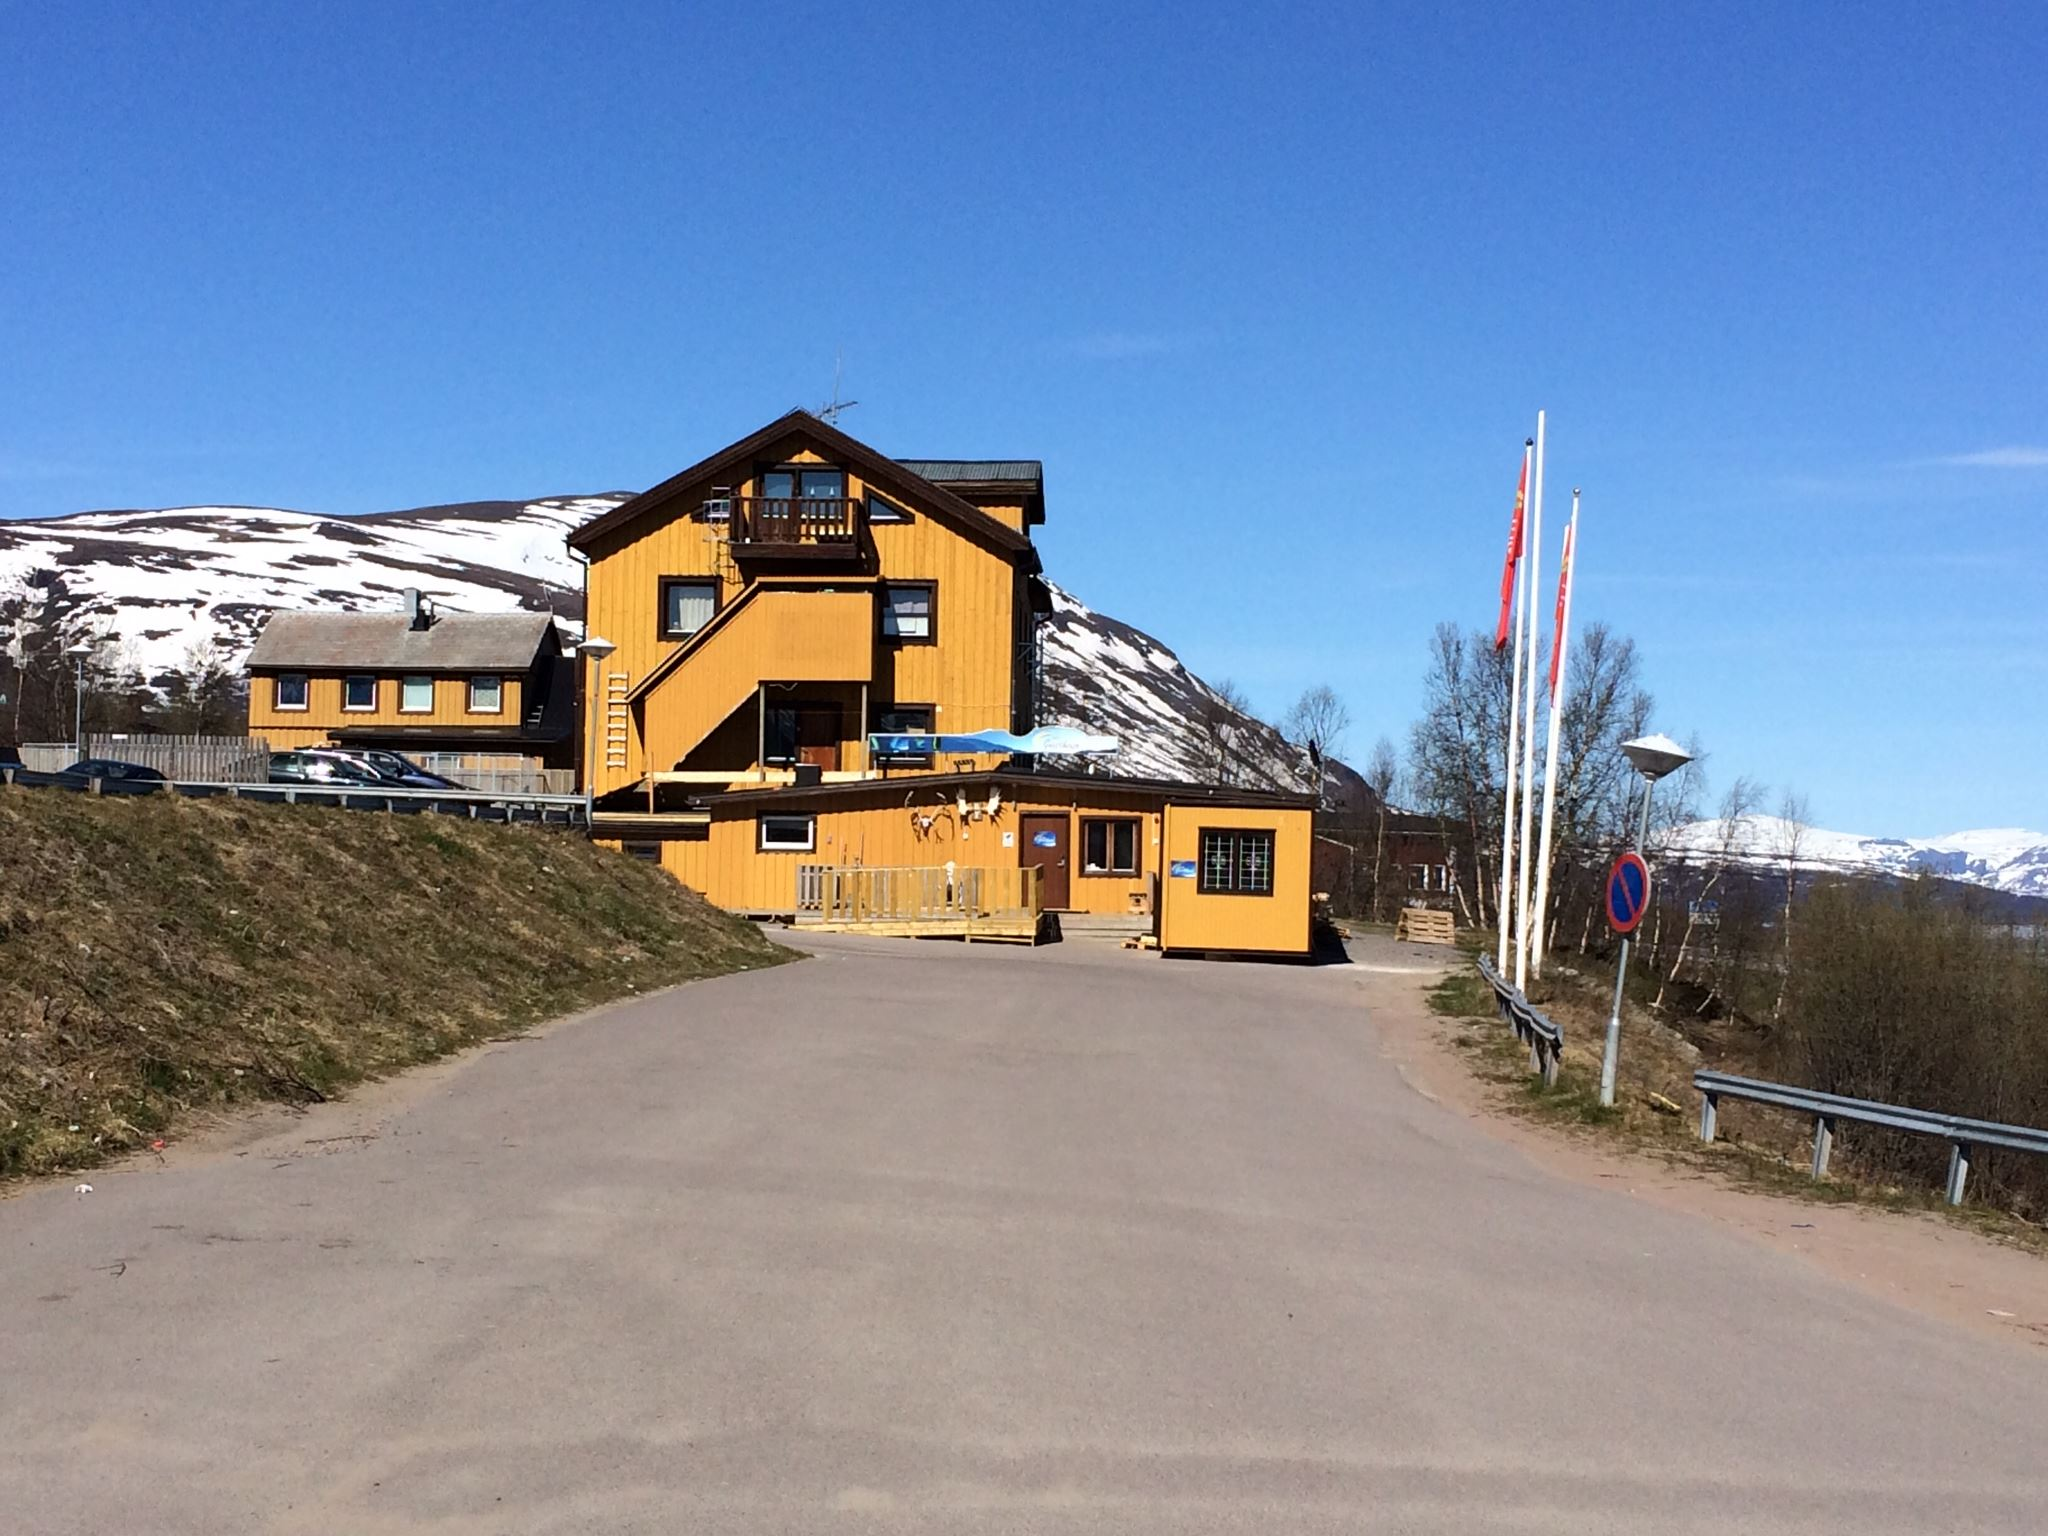 Abisko Guesthouse Vandrarhem, SVIF